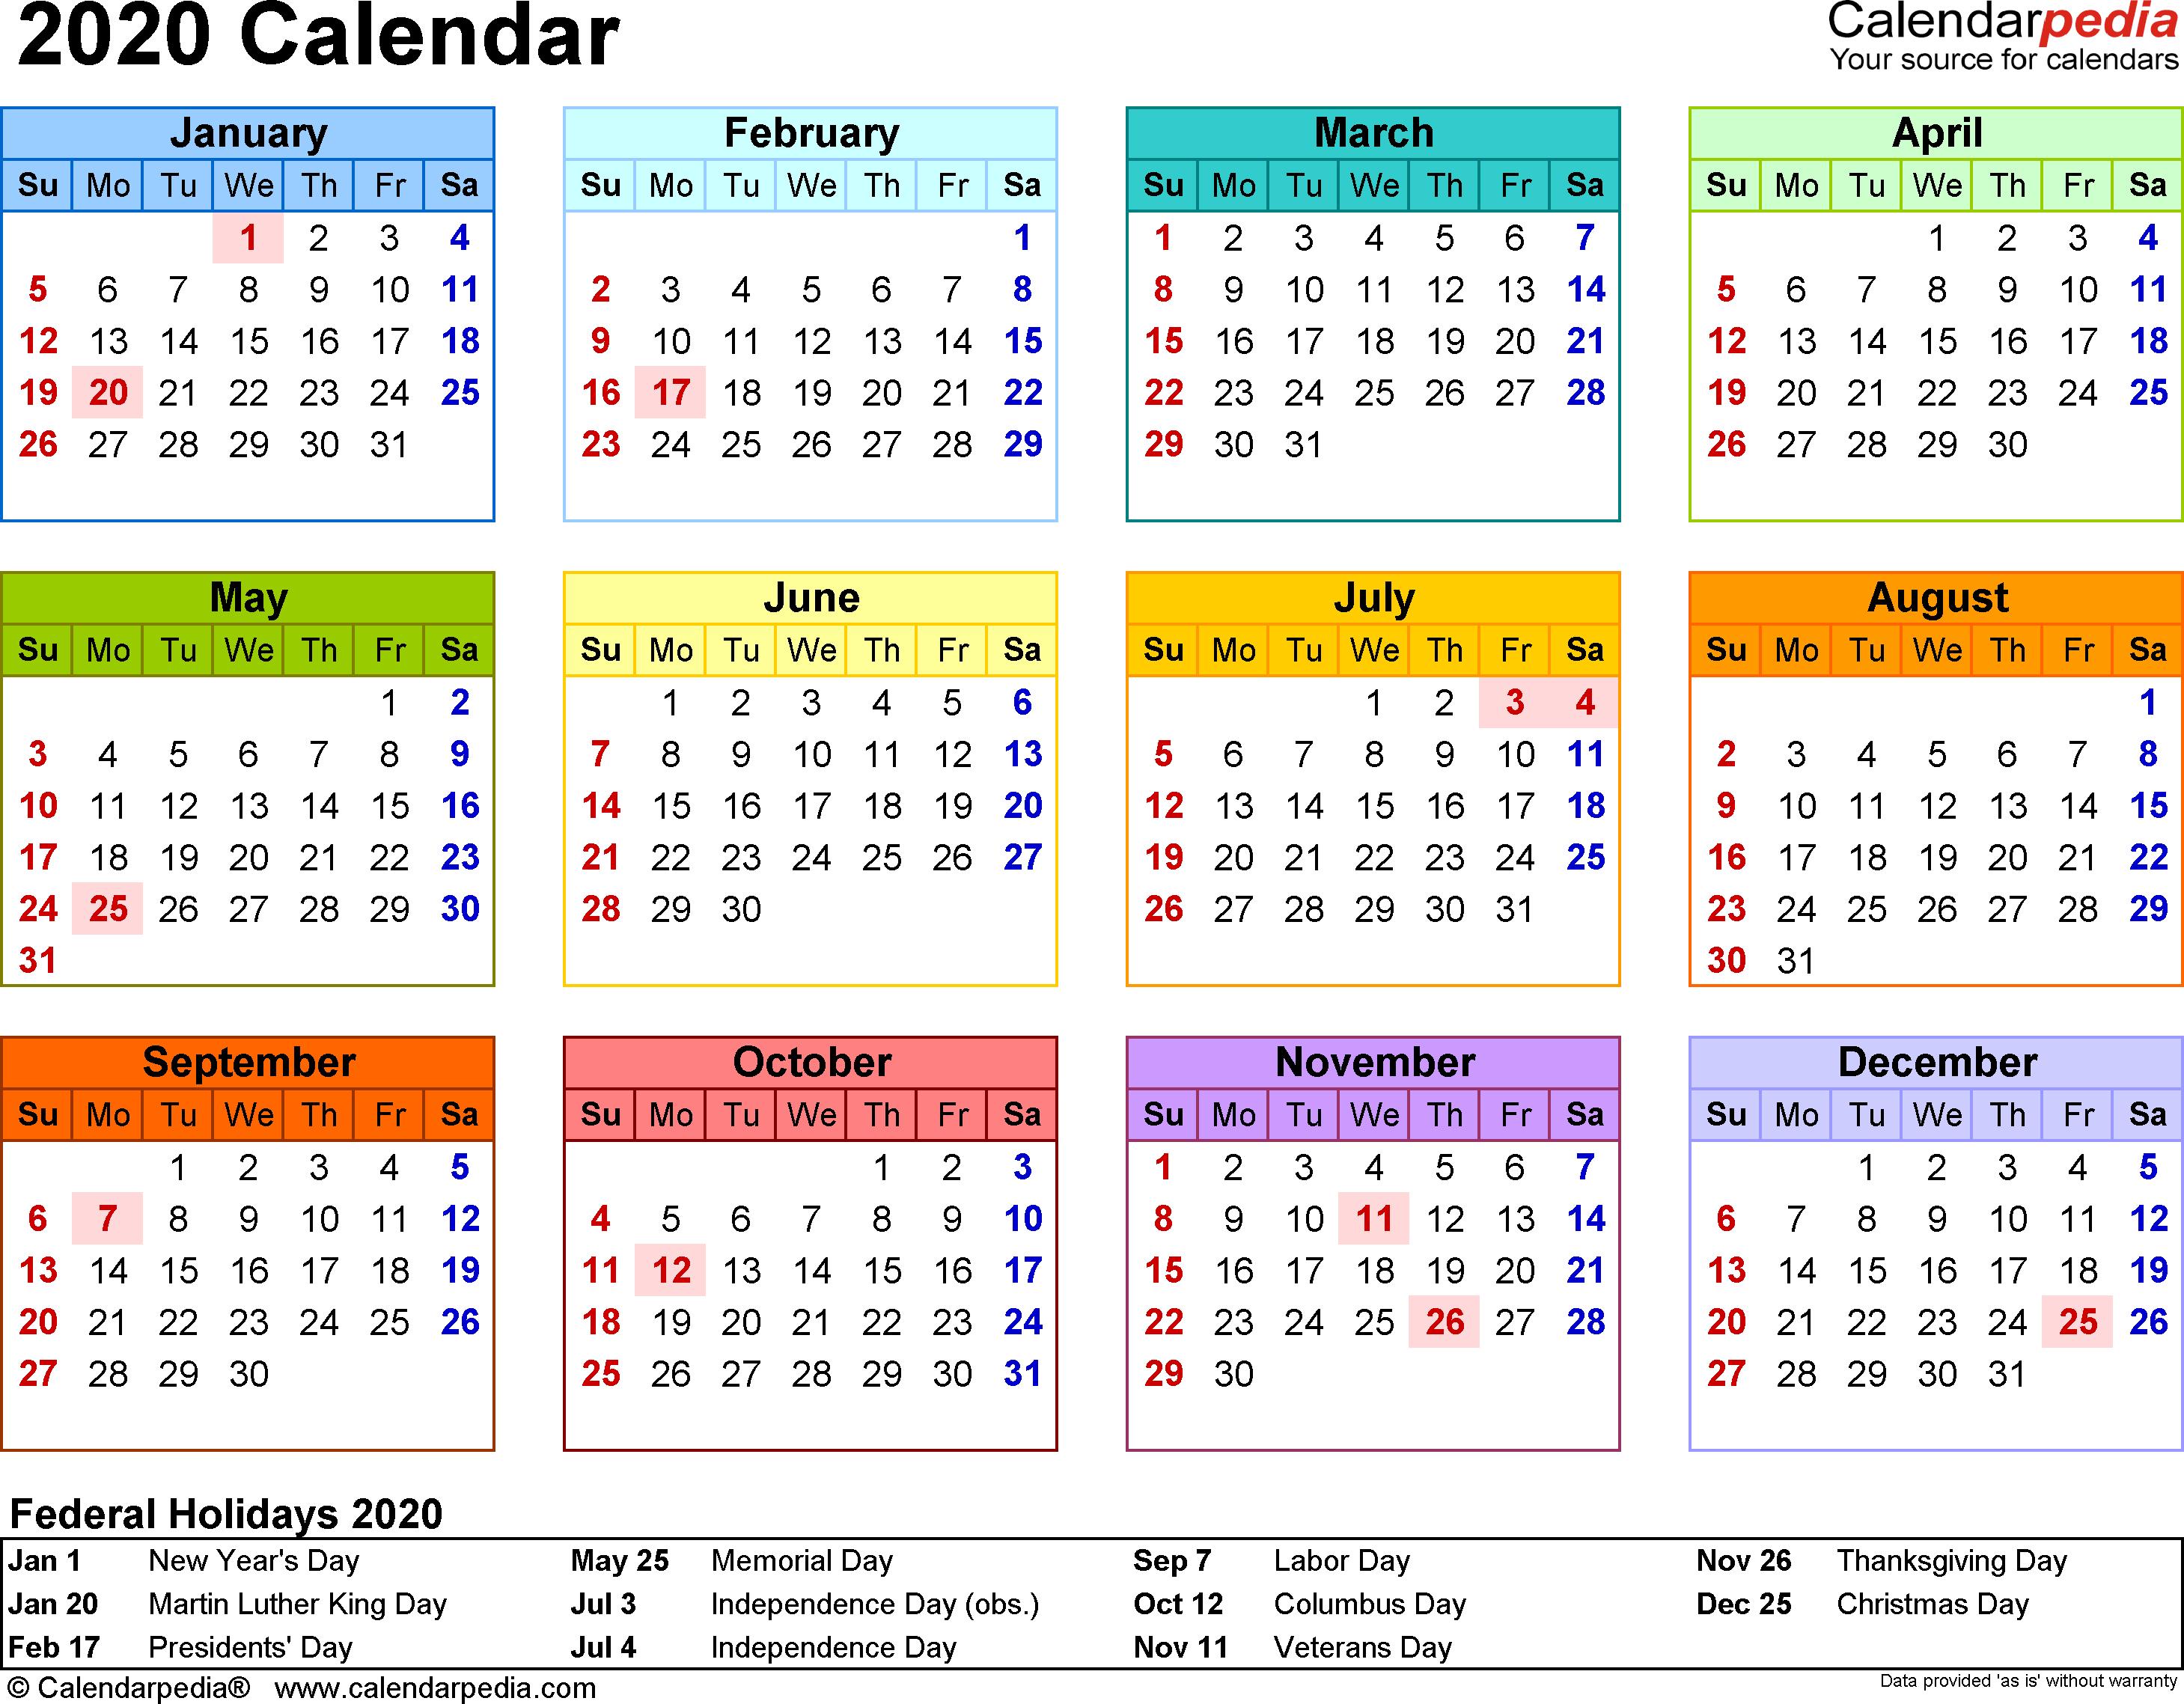 2020 Calendar Pdf - 17 Free Printable Calendar Templates with regard to 2020 Year At A Glance Free Printable Calendar